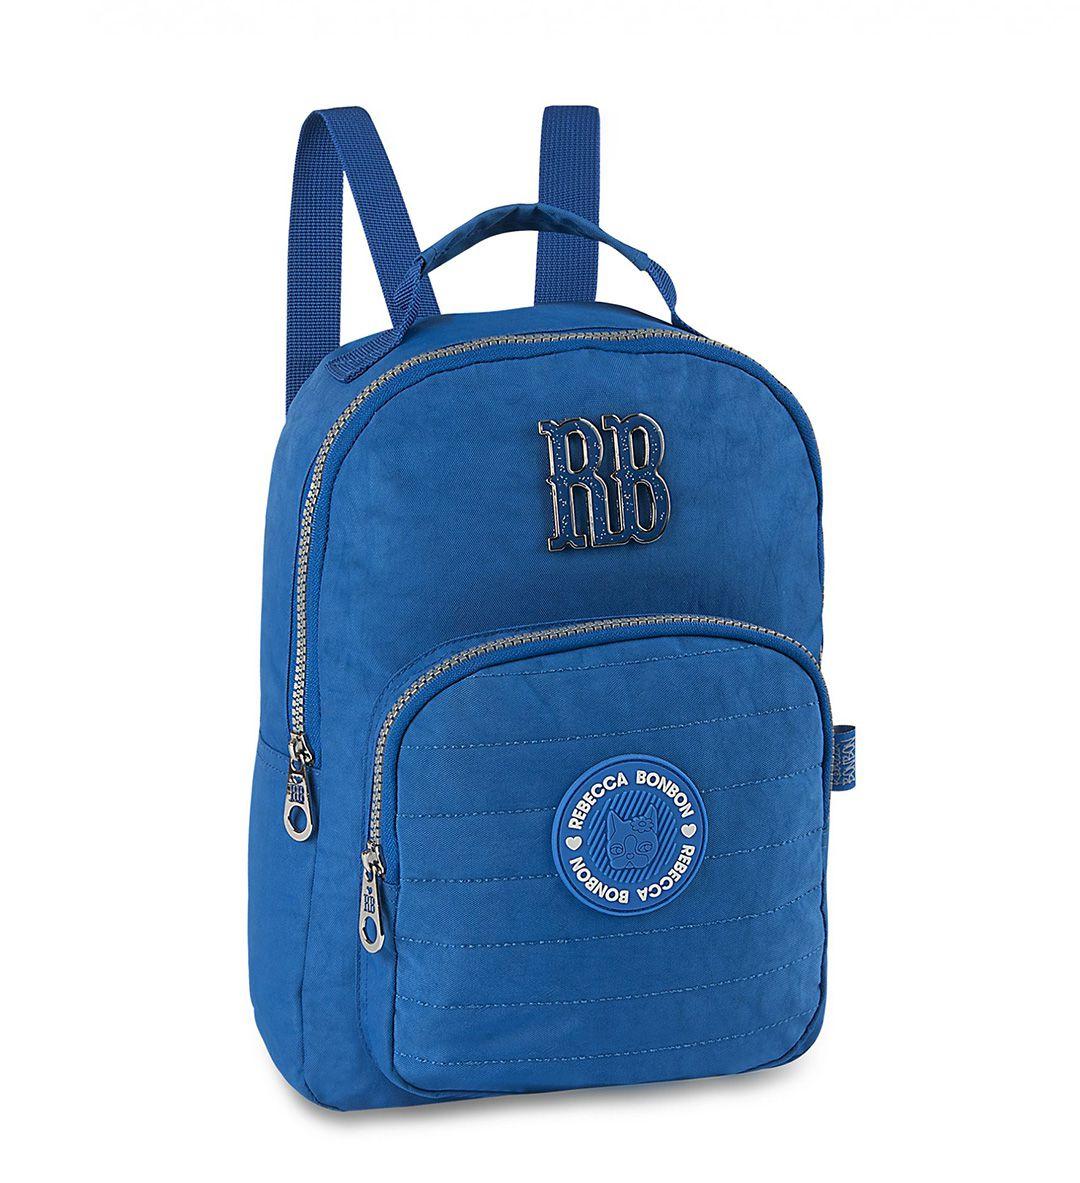 Mochilinha Rebecca Bonbon RB2043 Moda Moderna Pequena Azul